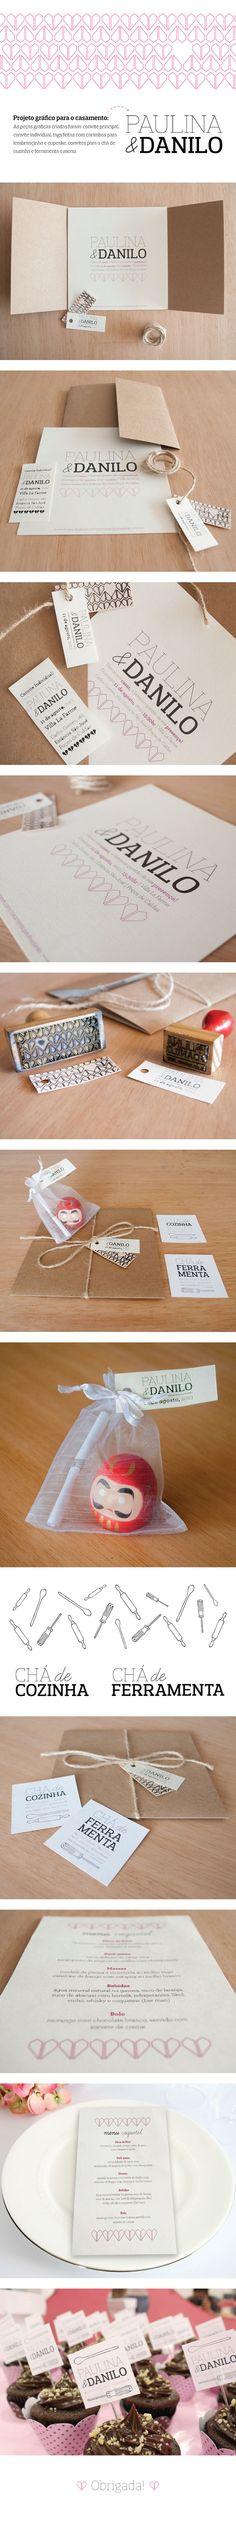 Paulina + Danilo wedding invitation on Behance